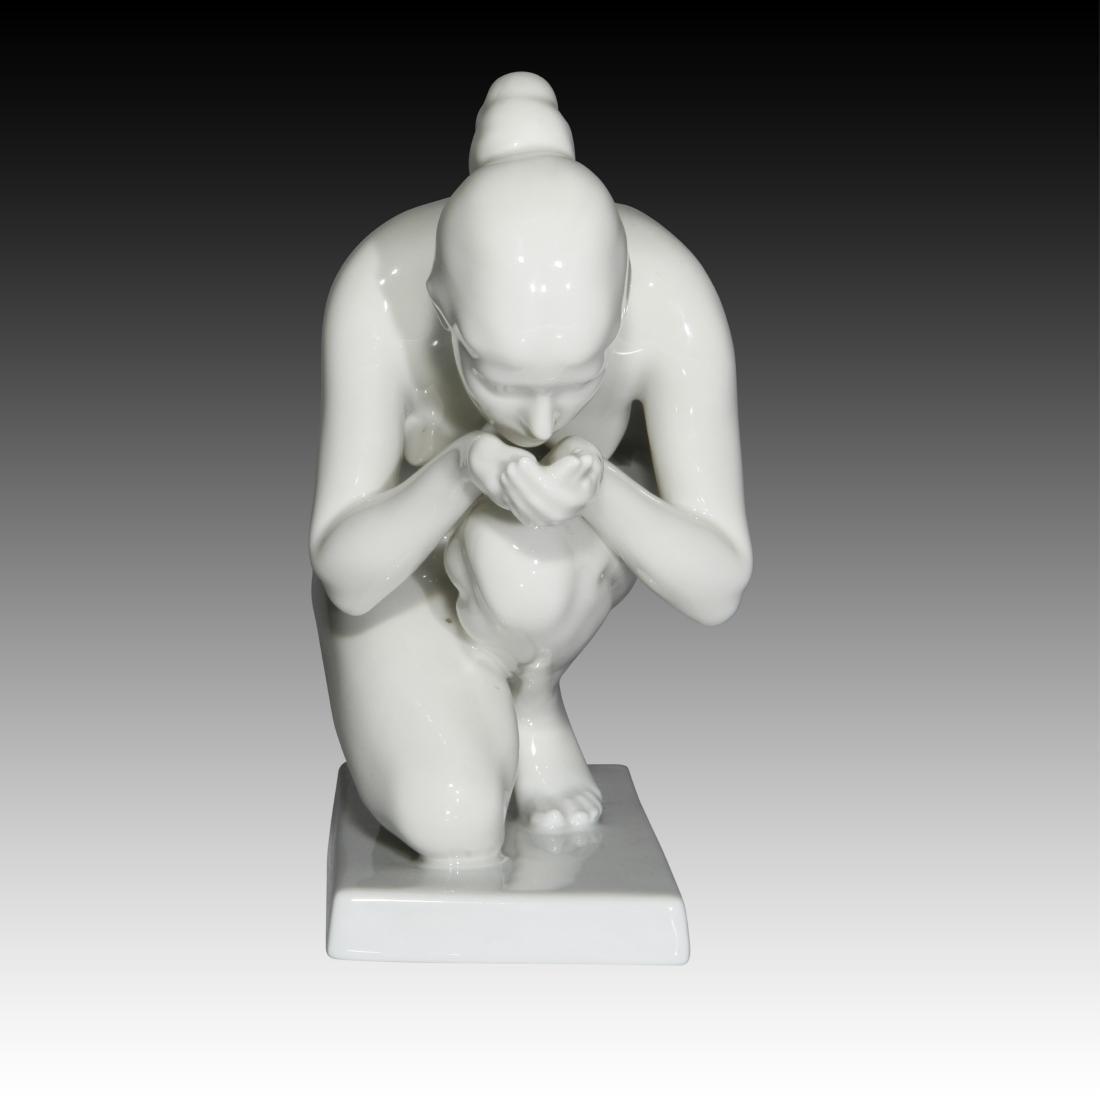 Rosenthal Nude Female Drinking Water Figurine